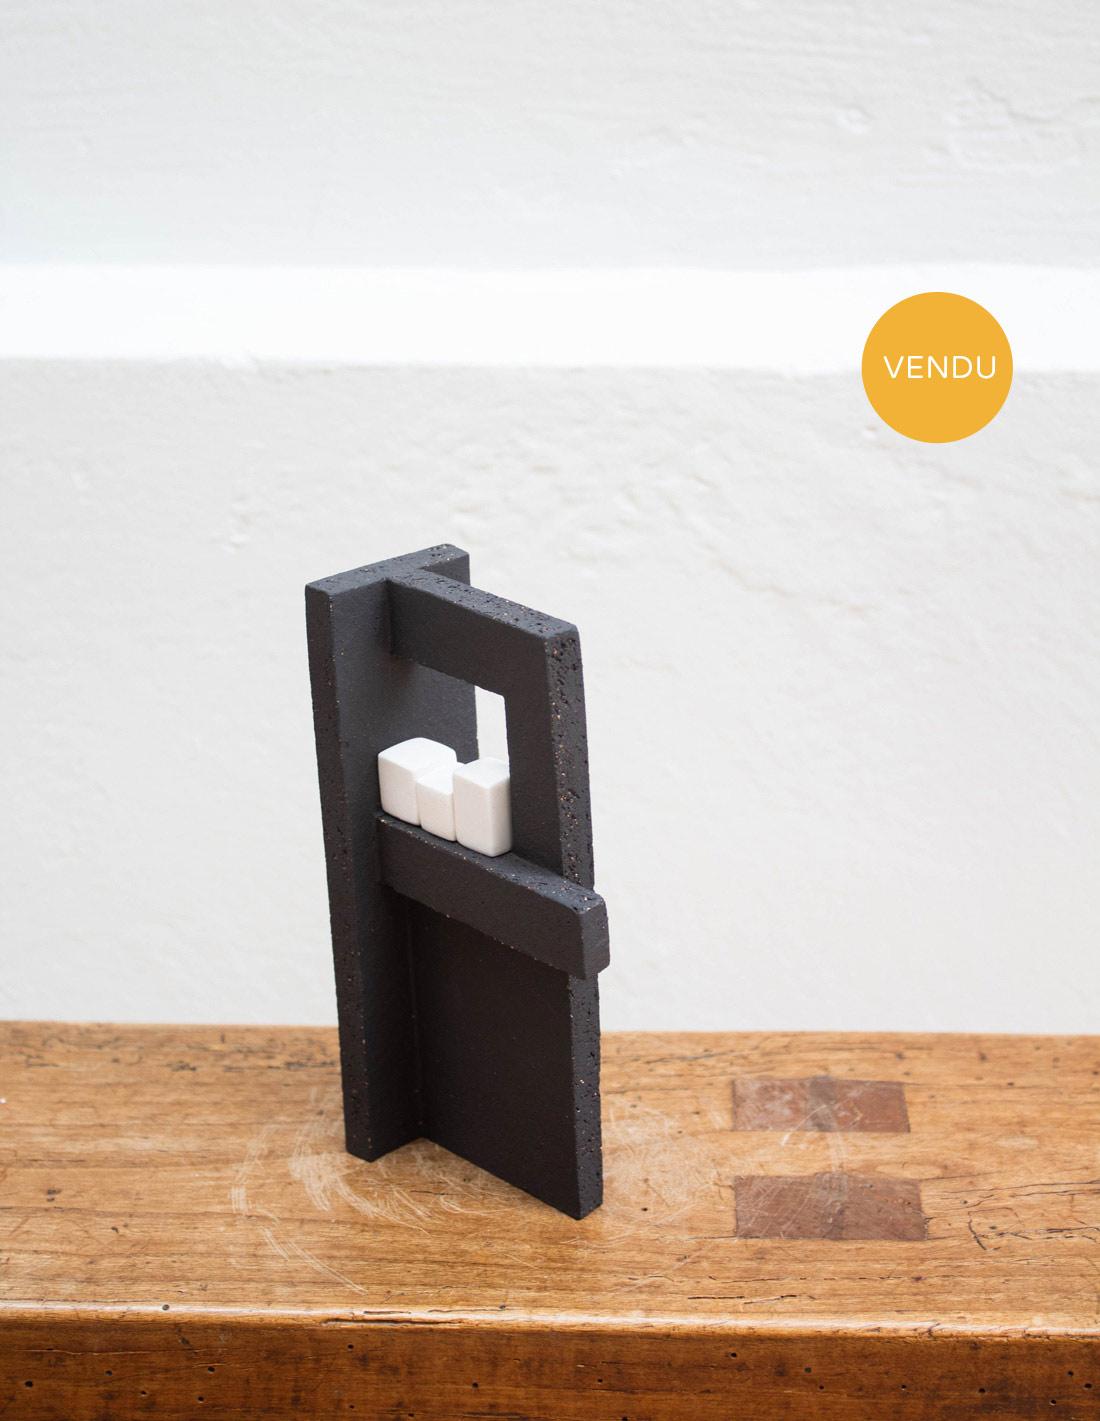 collection-cube-3-1-vendu